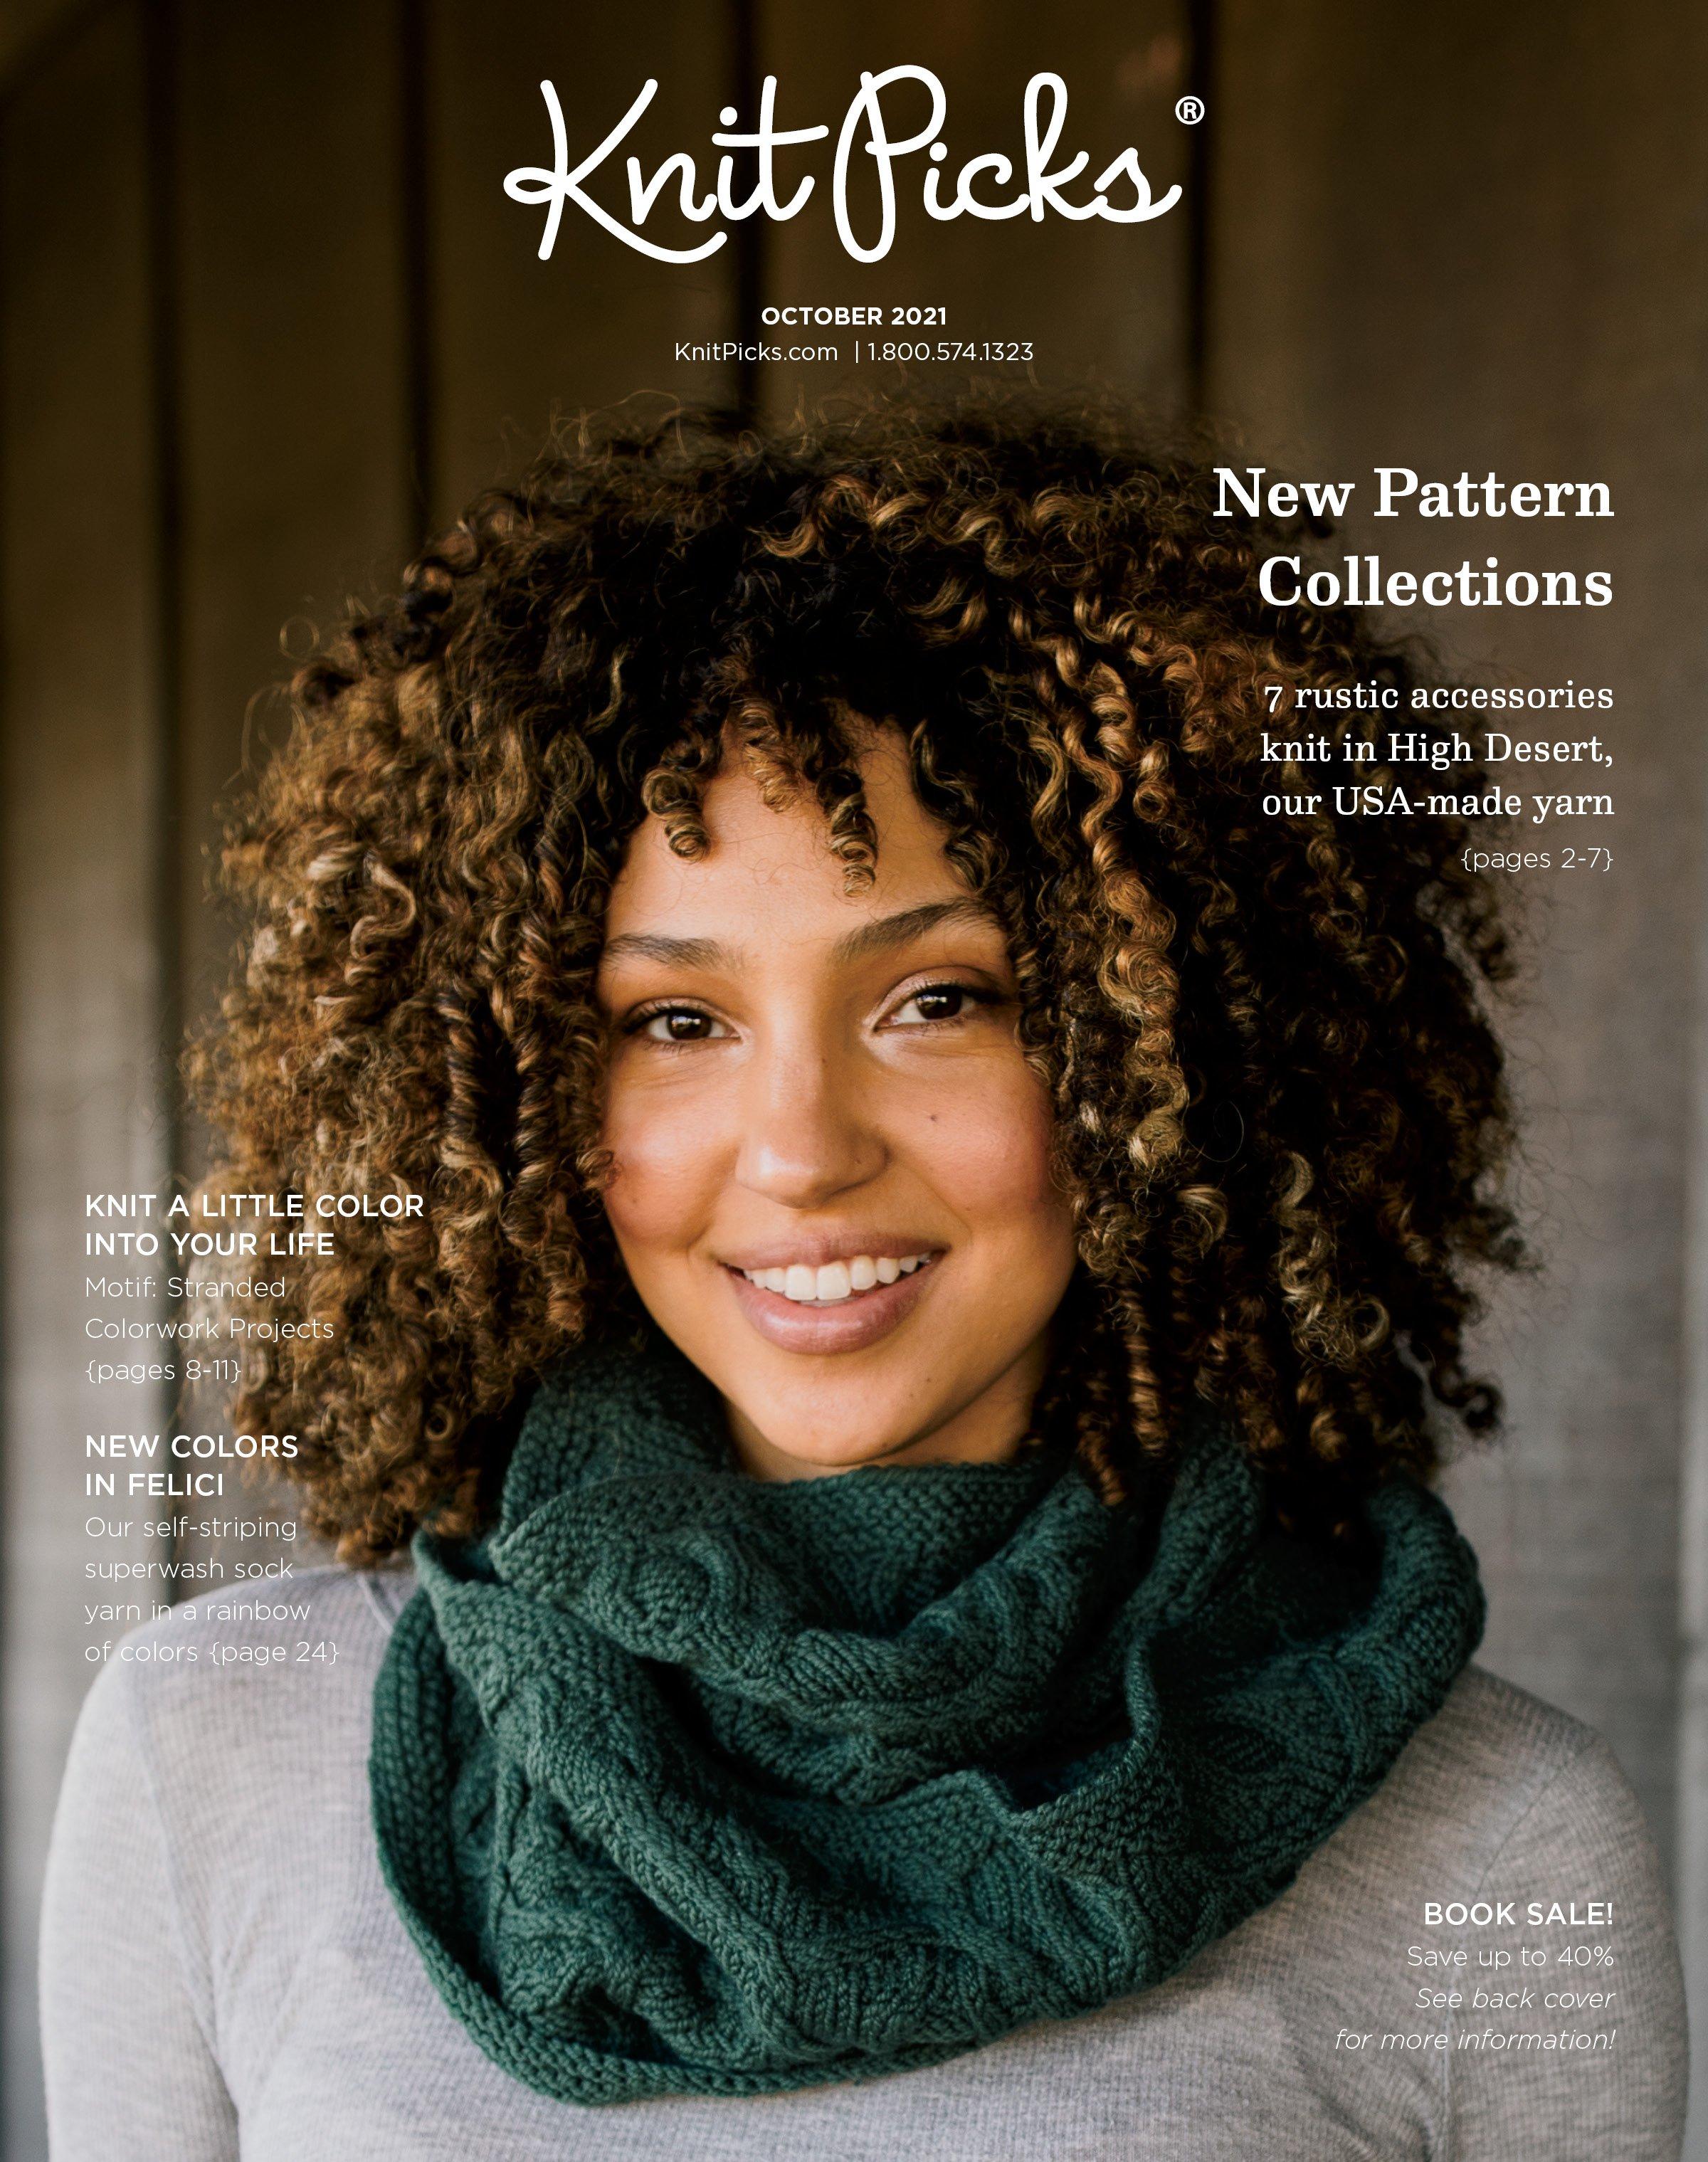 Knit Picks Online Catalog